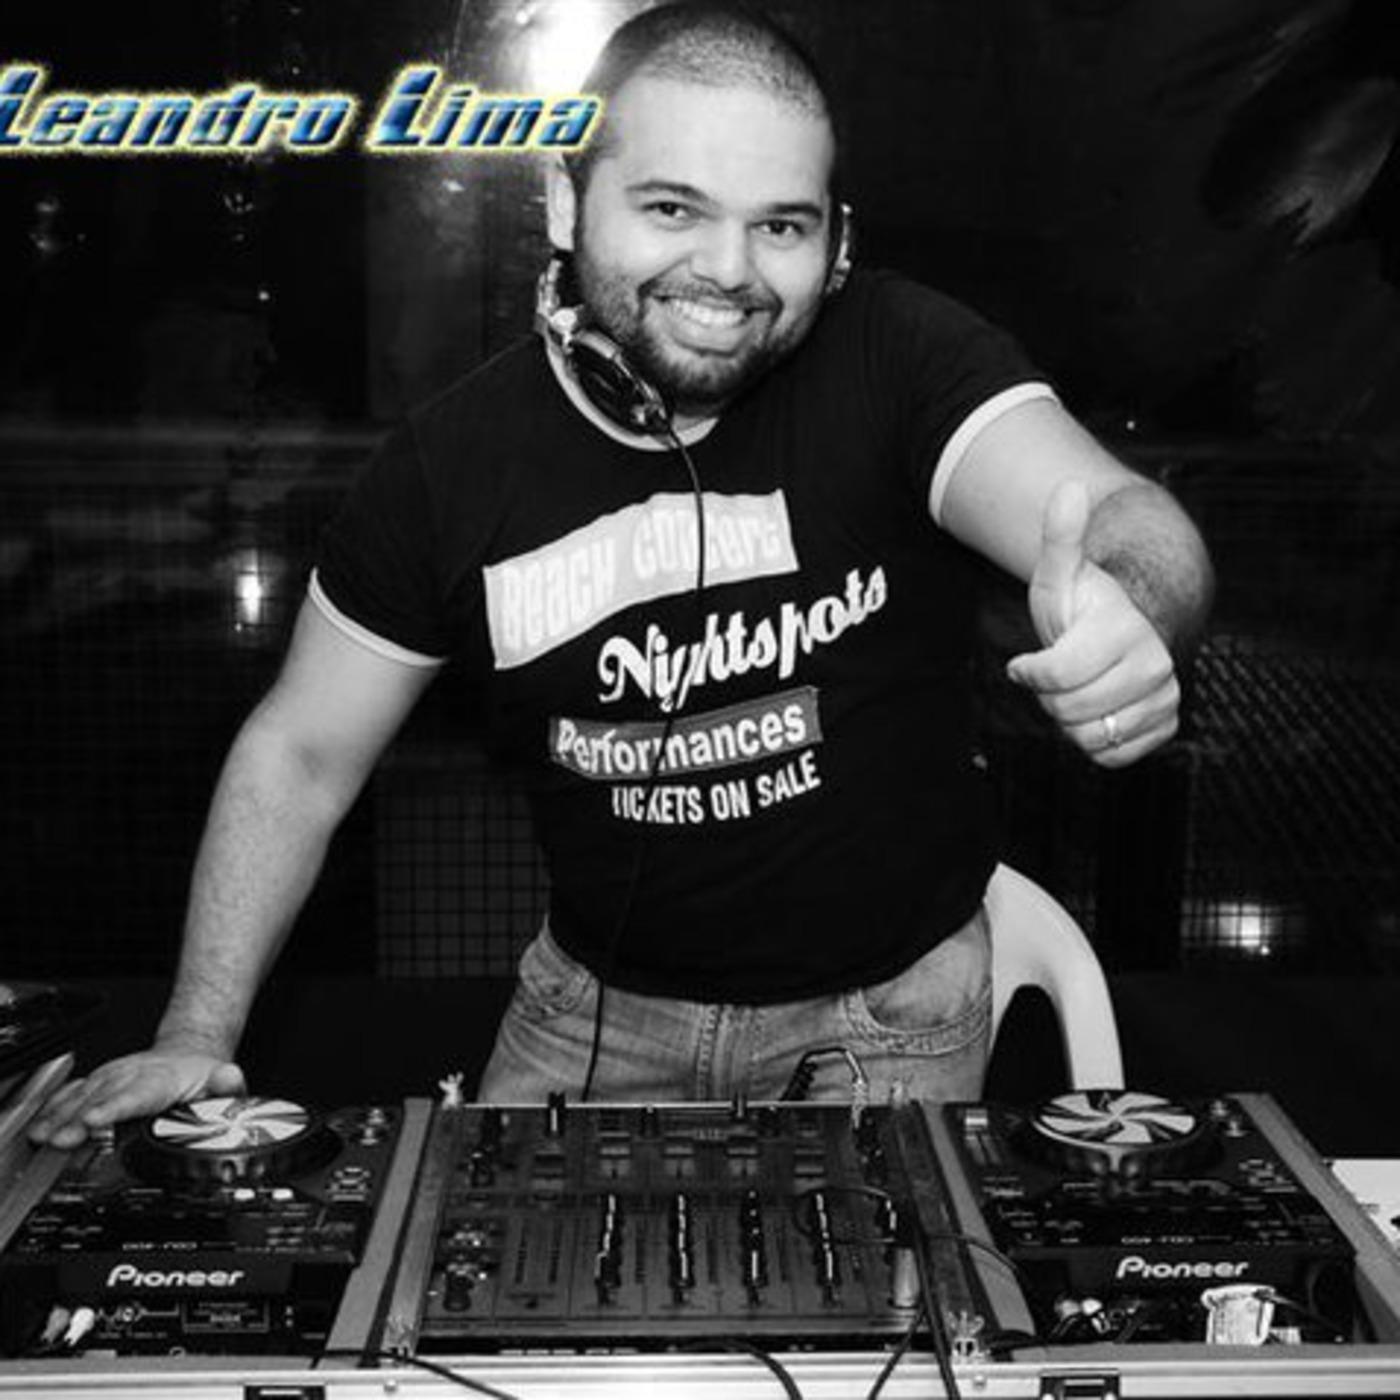 DJ Leandro Lima's Podcast